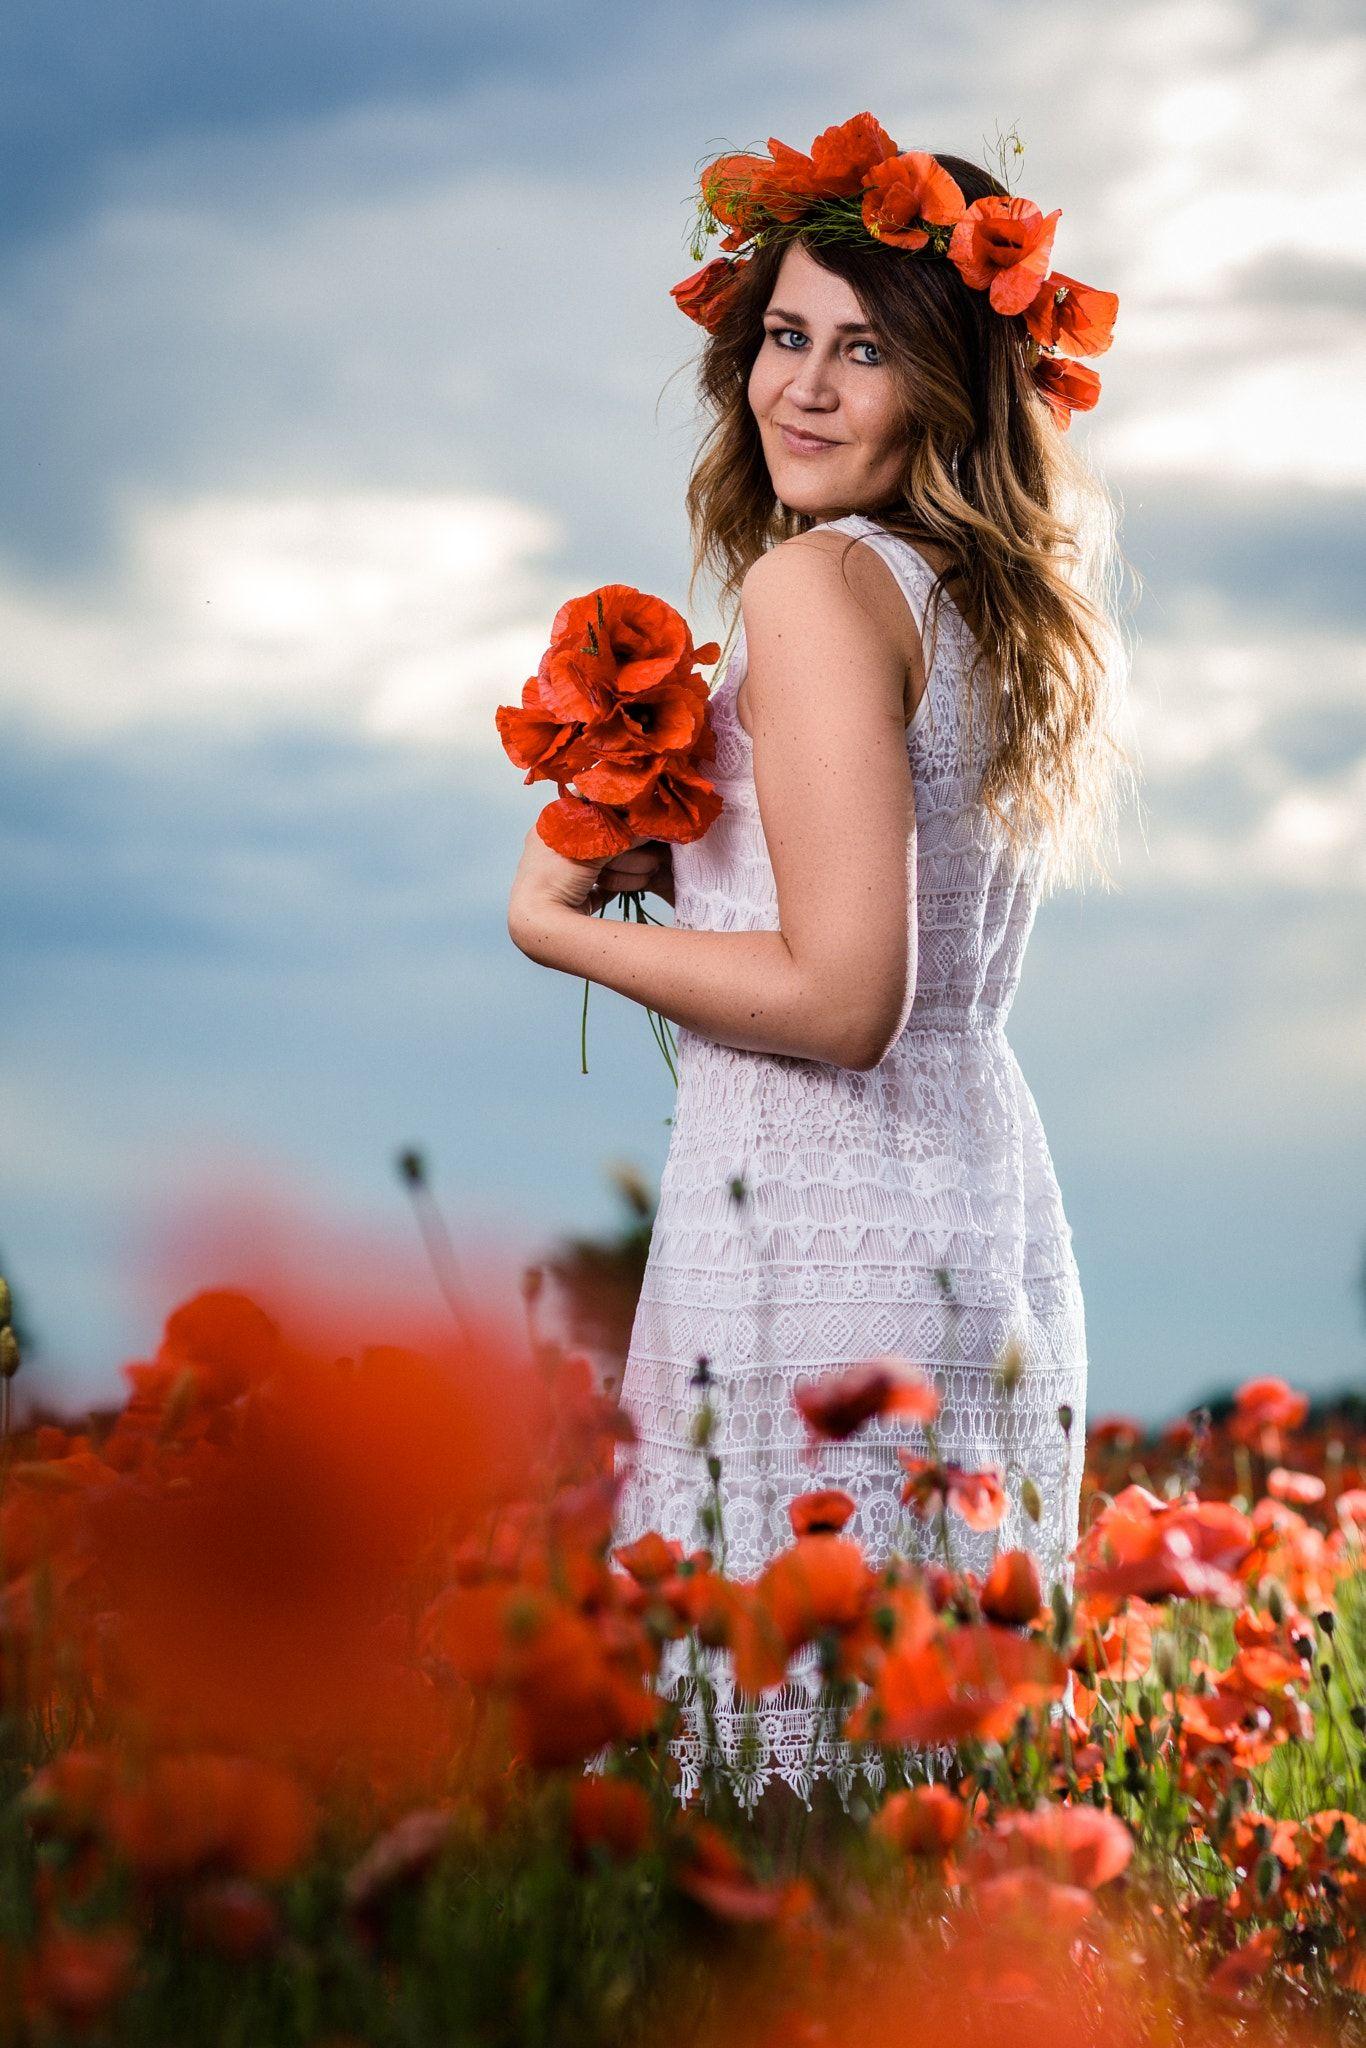 Poppy II - Model  Jenny   Robes romantiques et féminines   Pinterest ... d31961d8dc5b